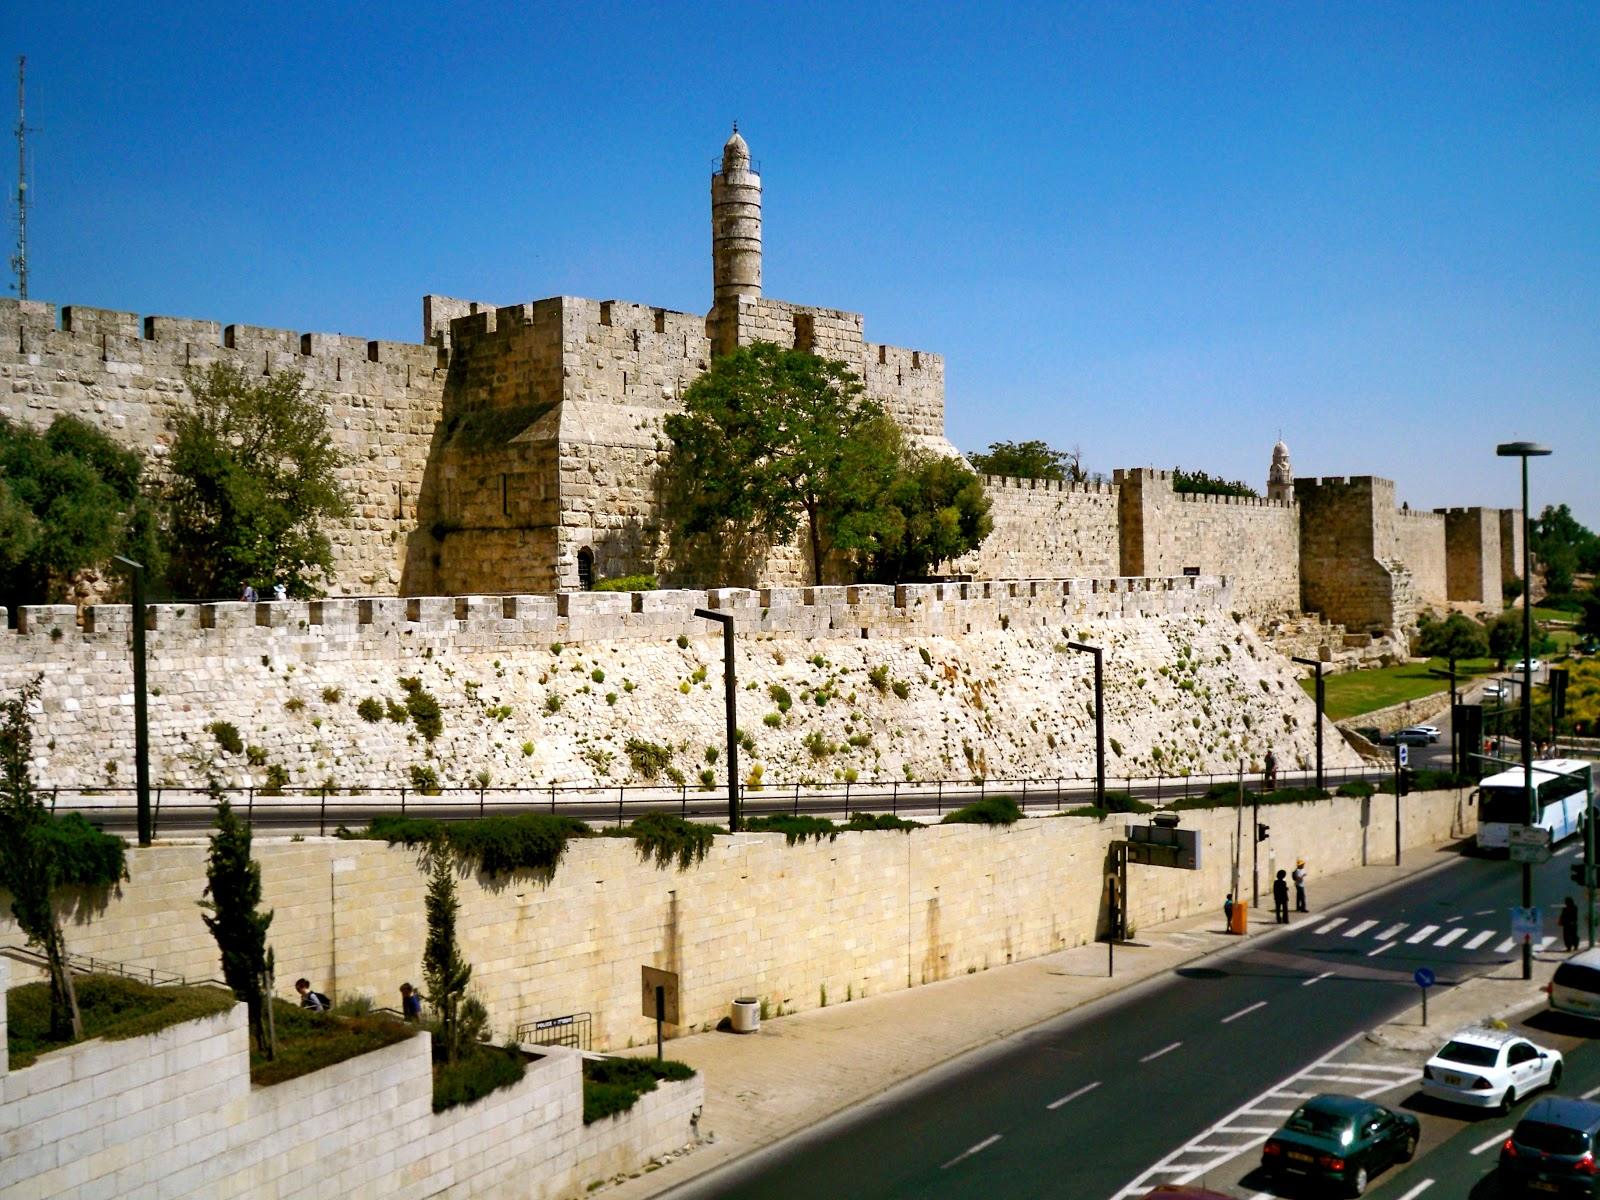 Jerusalem+walls+street